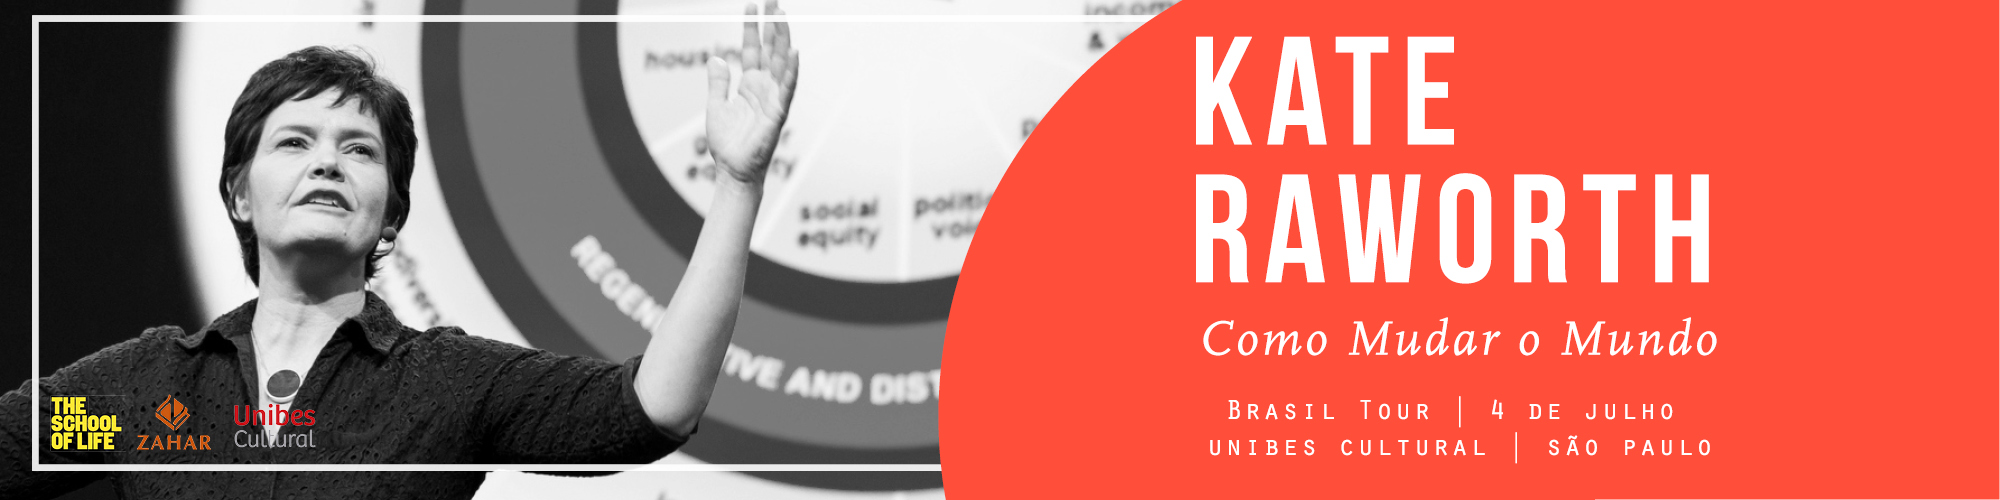 Kate Raworth, economista da Universidade de Oxford, ministra palestra na Unibes Cultural